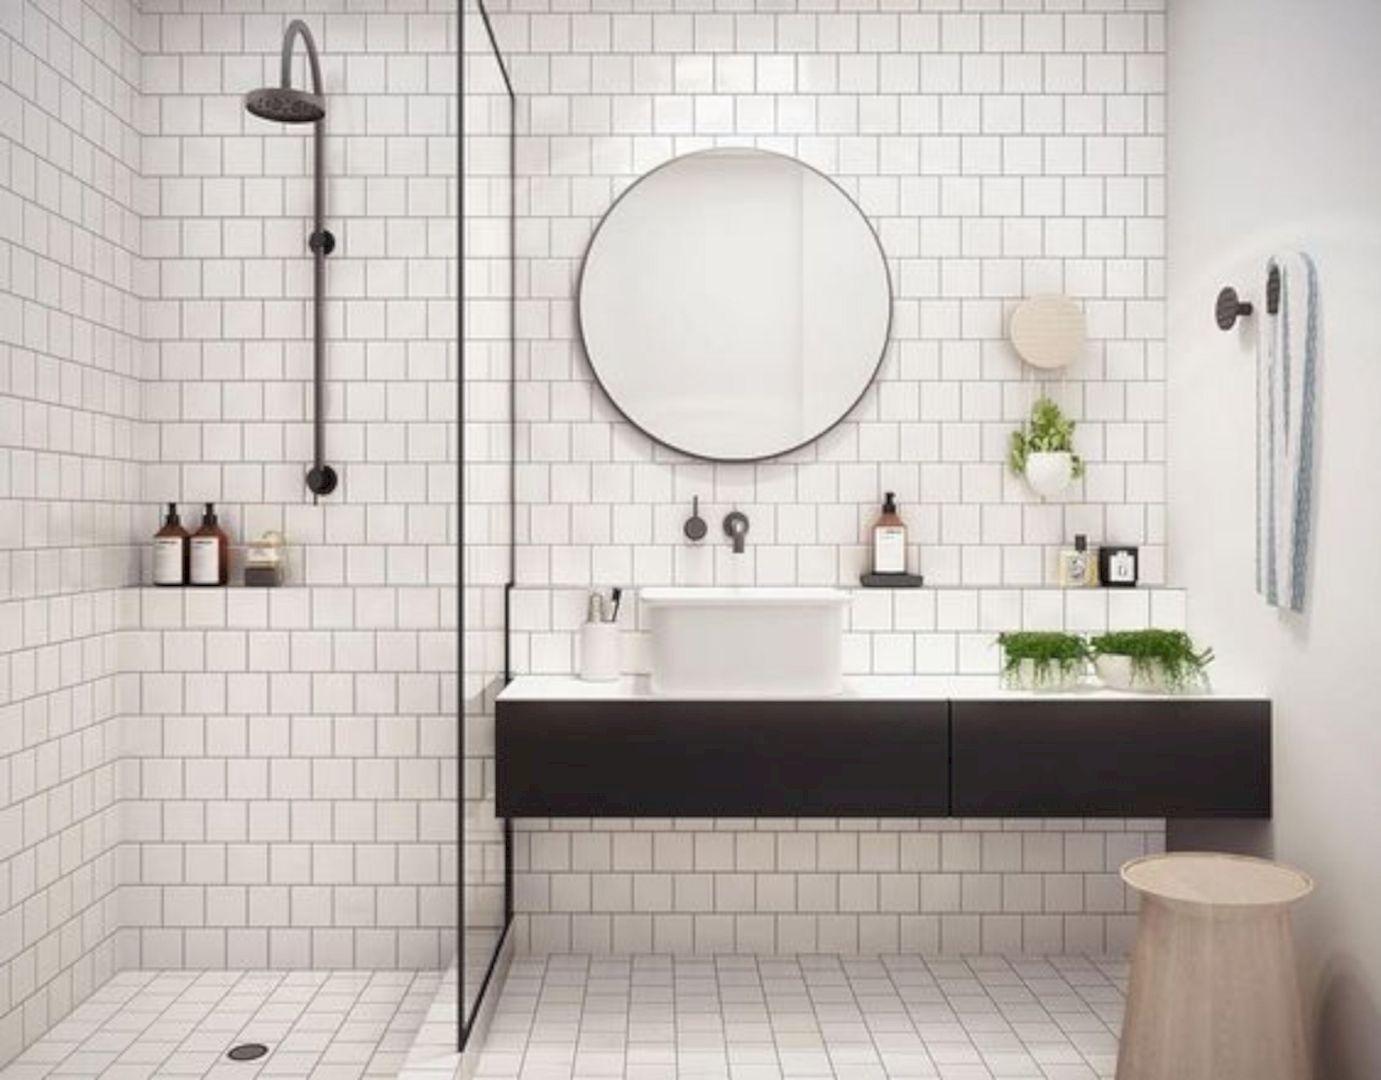 15 Inspiring Bathroom Design Ideas with IKEA | Bathroom designs ...